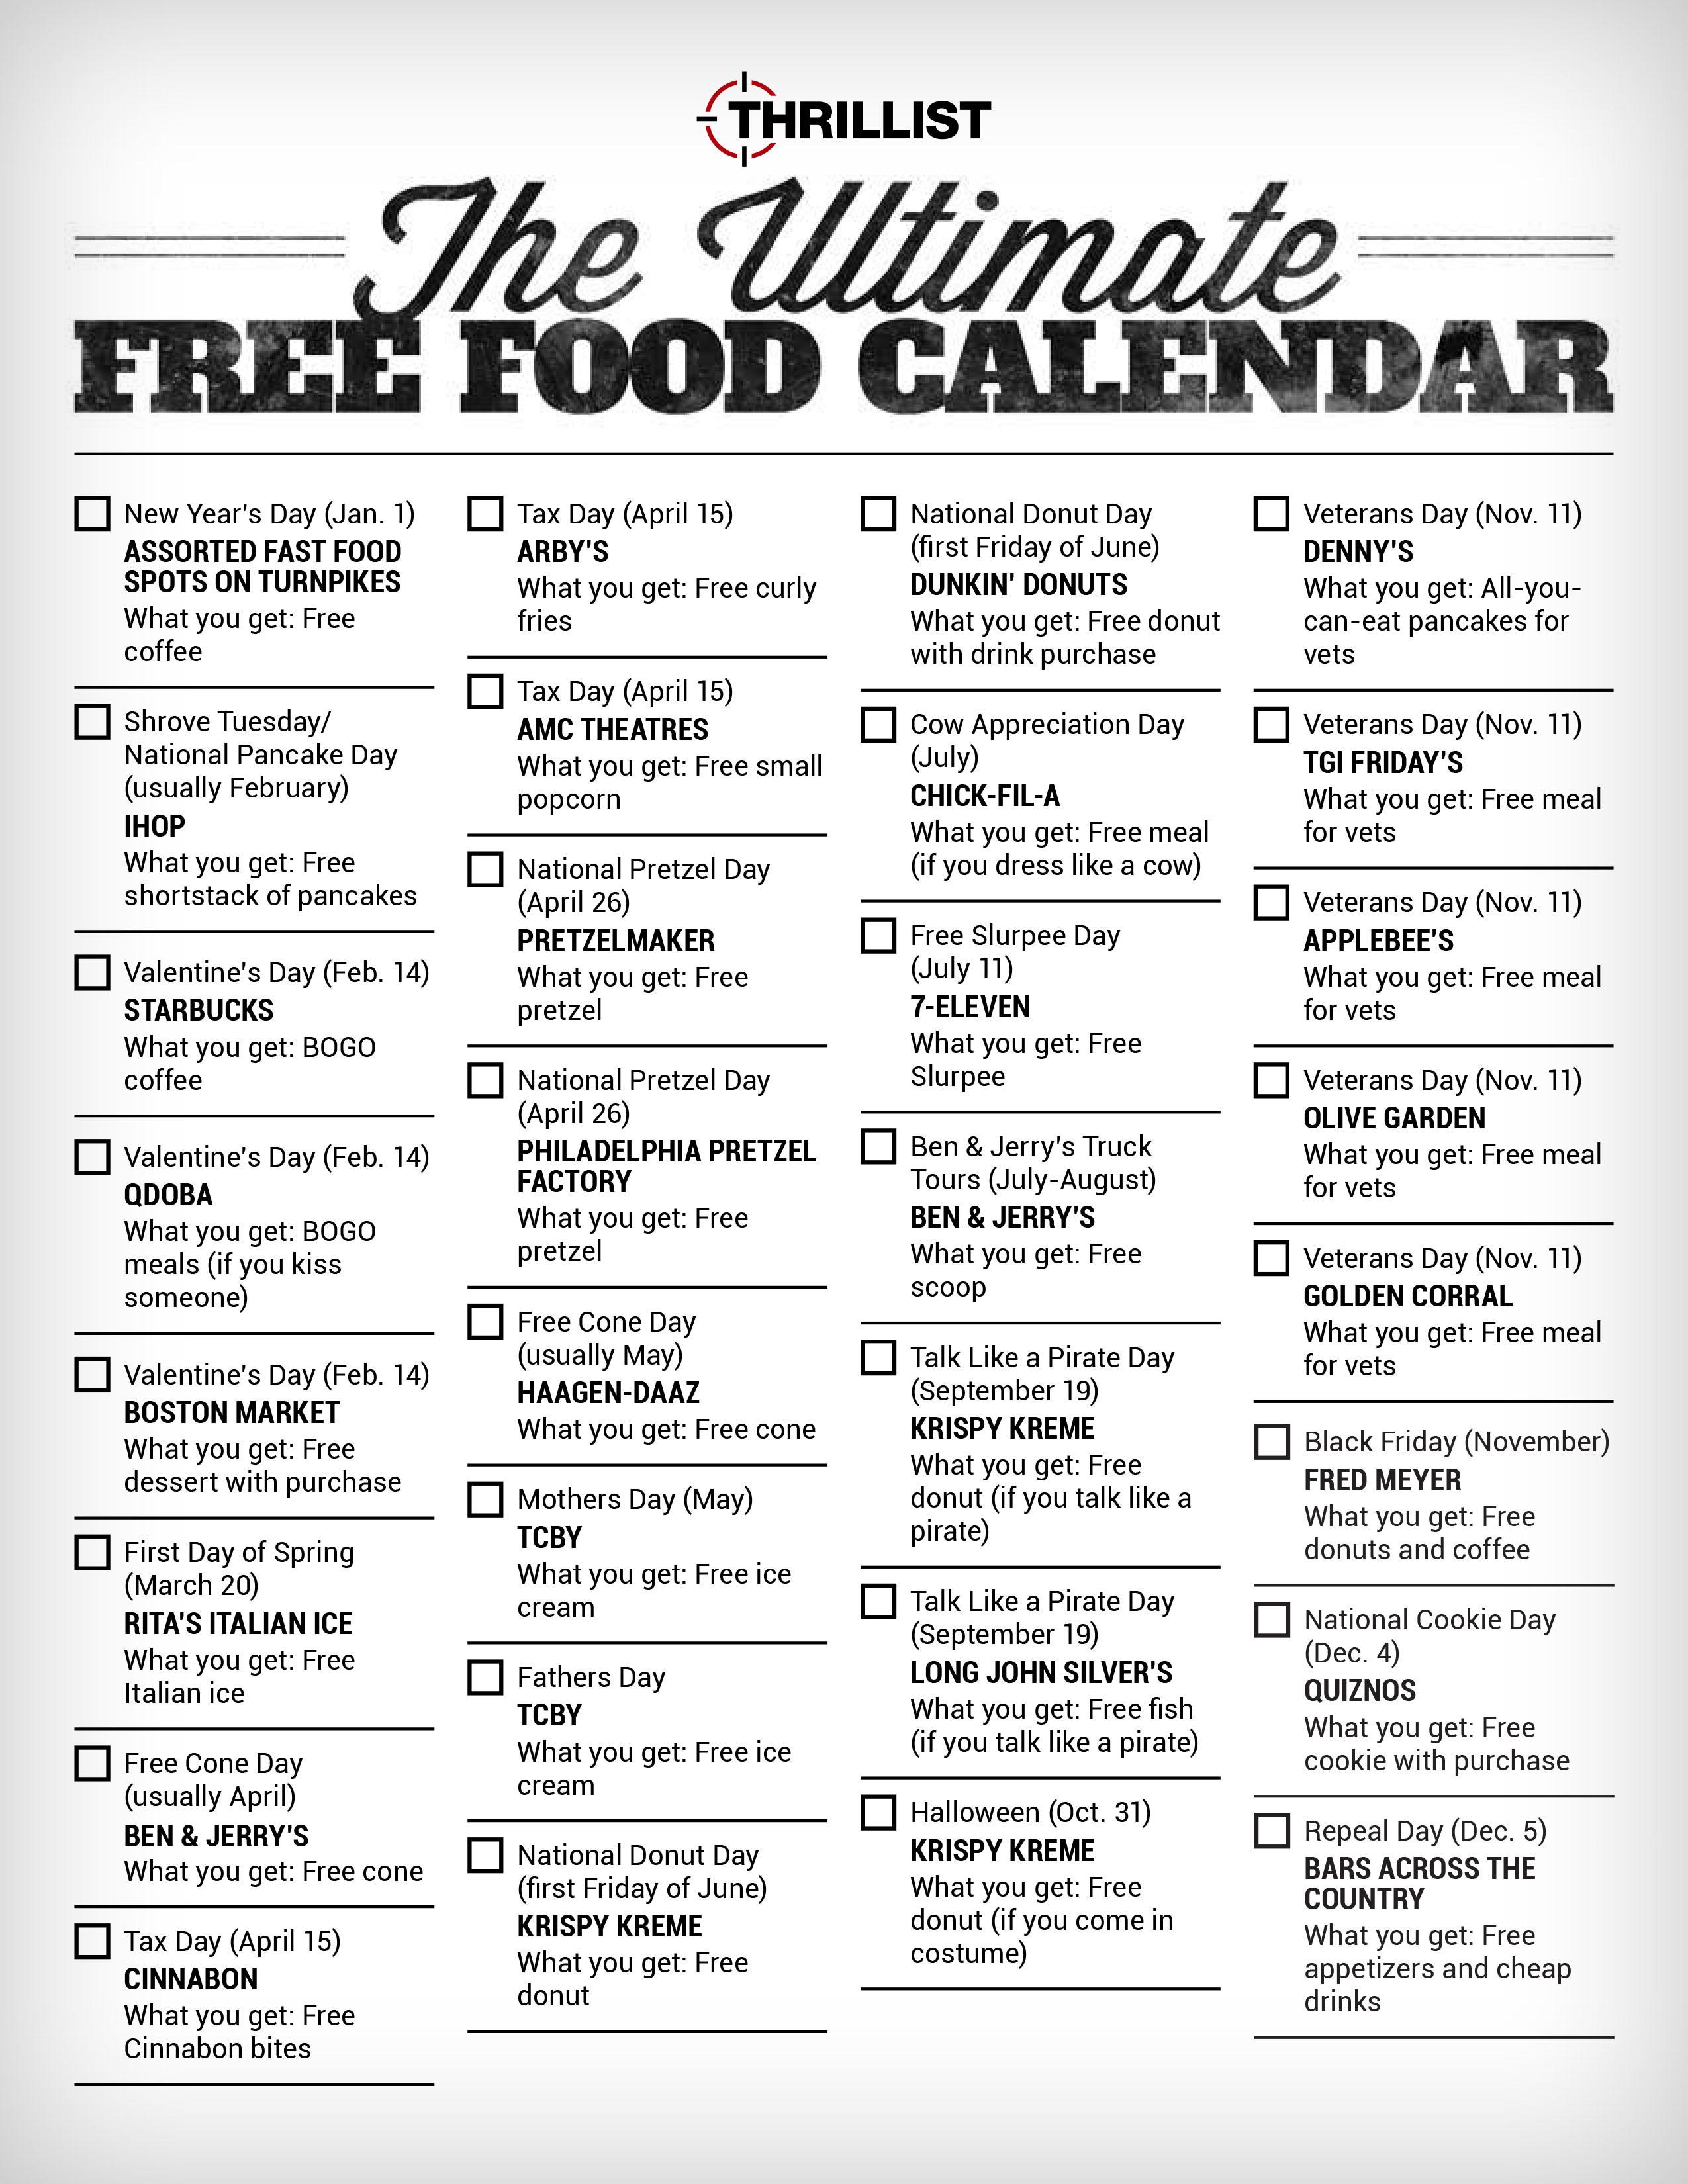 free food holidays national pancake day free slurpee day and